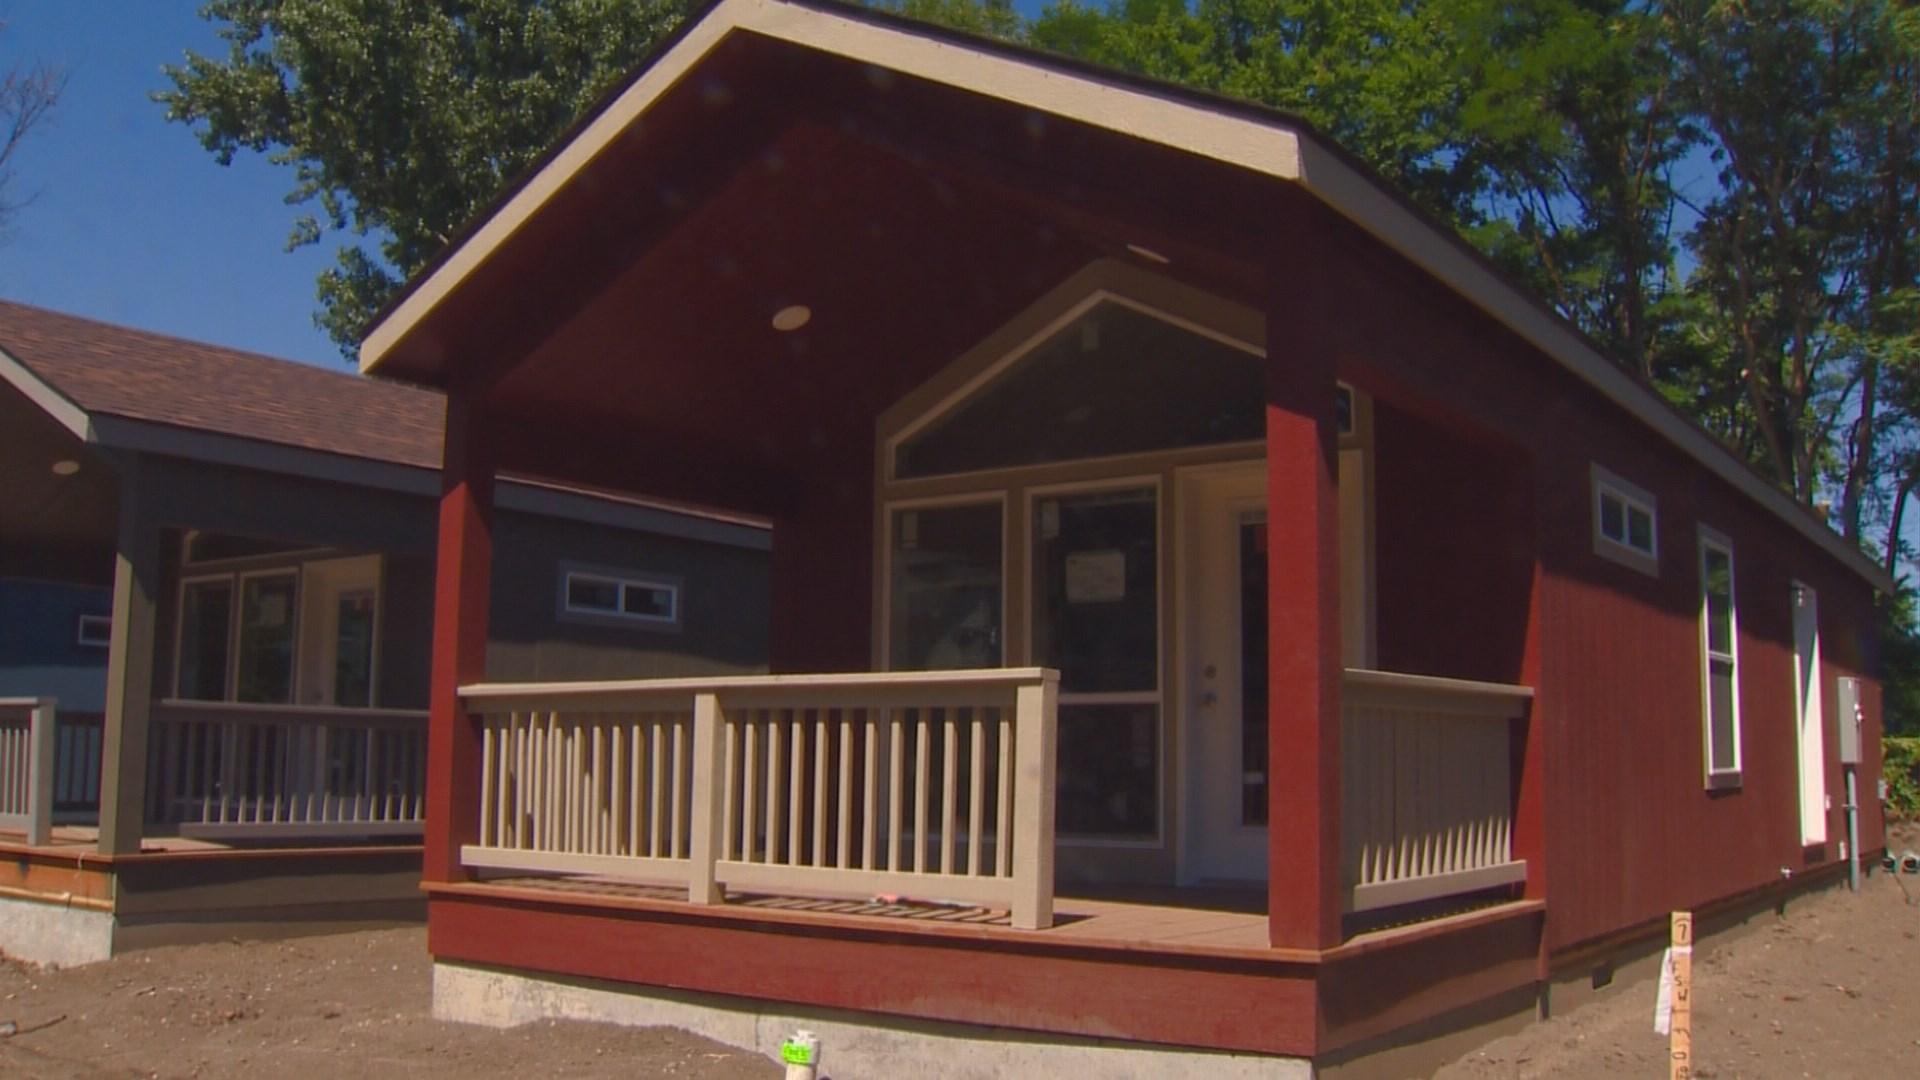 Modular Homes Used As Low Income Housing Option Ktvb Com